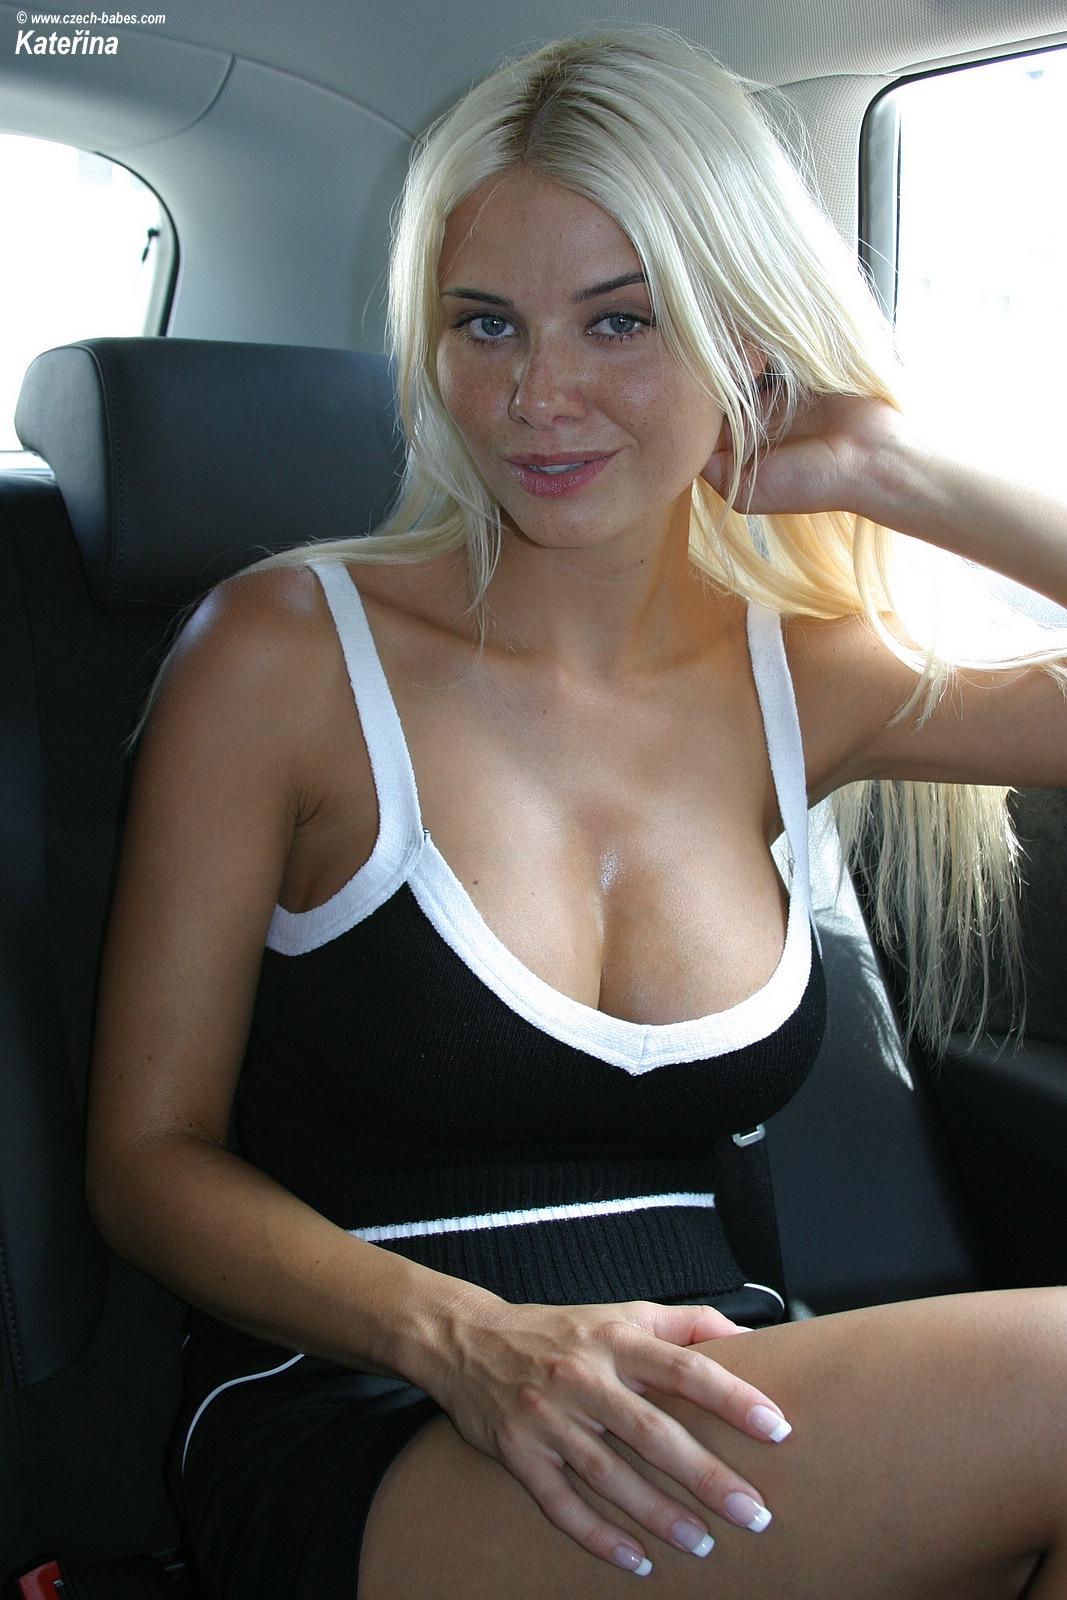 katerina-boobs-car-nude-czech-babes-07